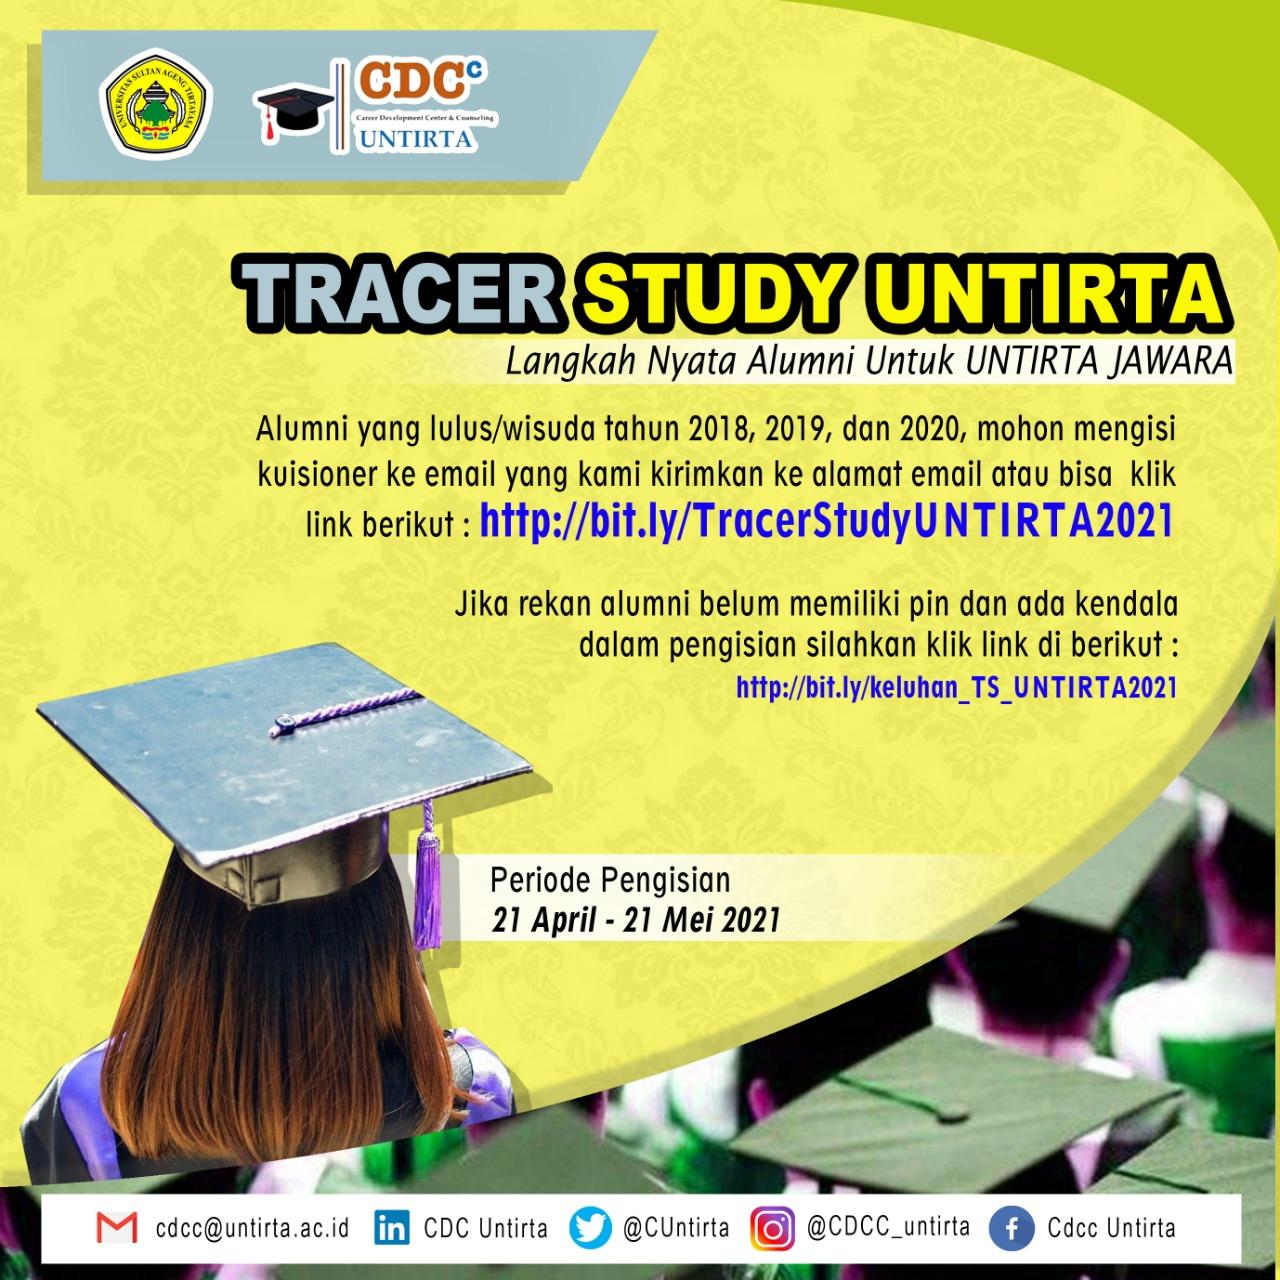 Tracer Study Untirta (Langkah Nyata Alumni untuk Untirta JAWARA)